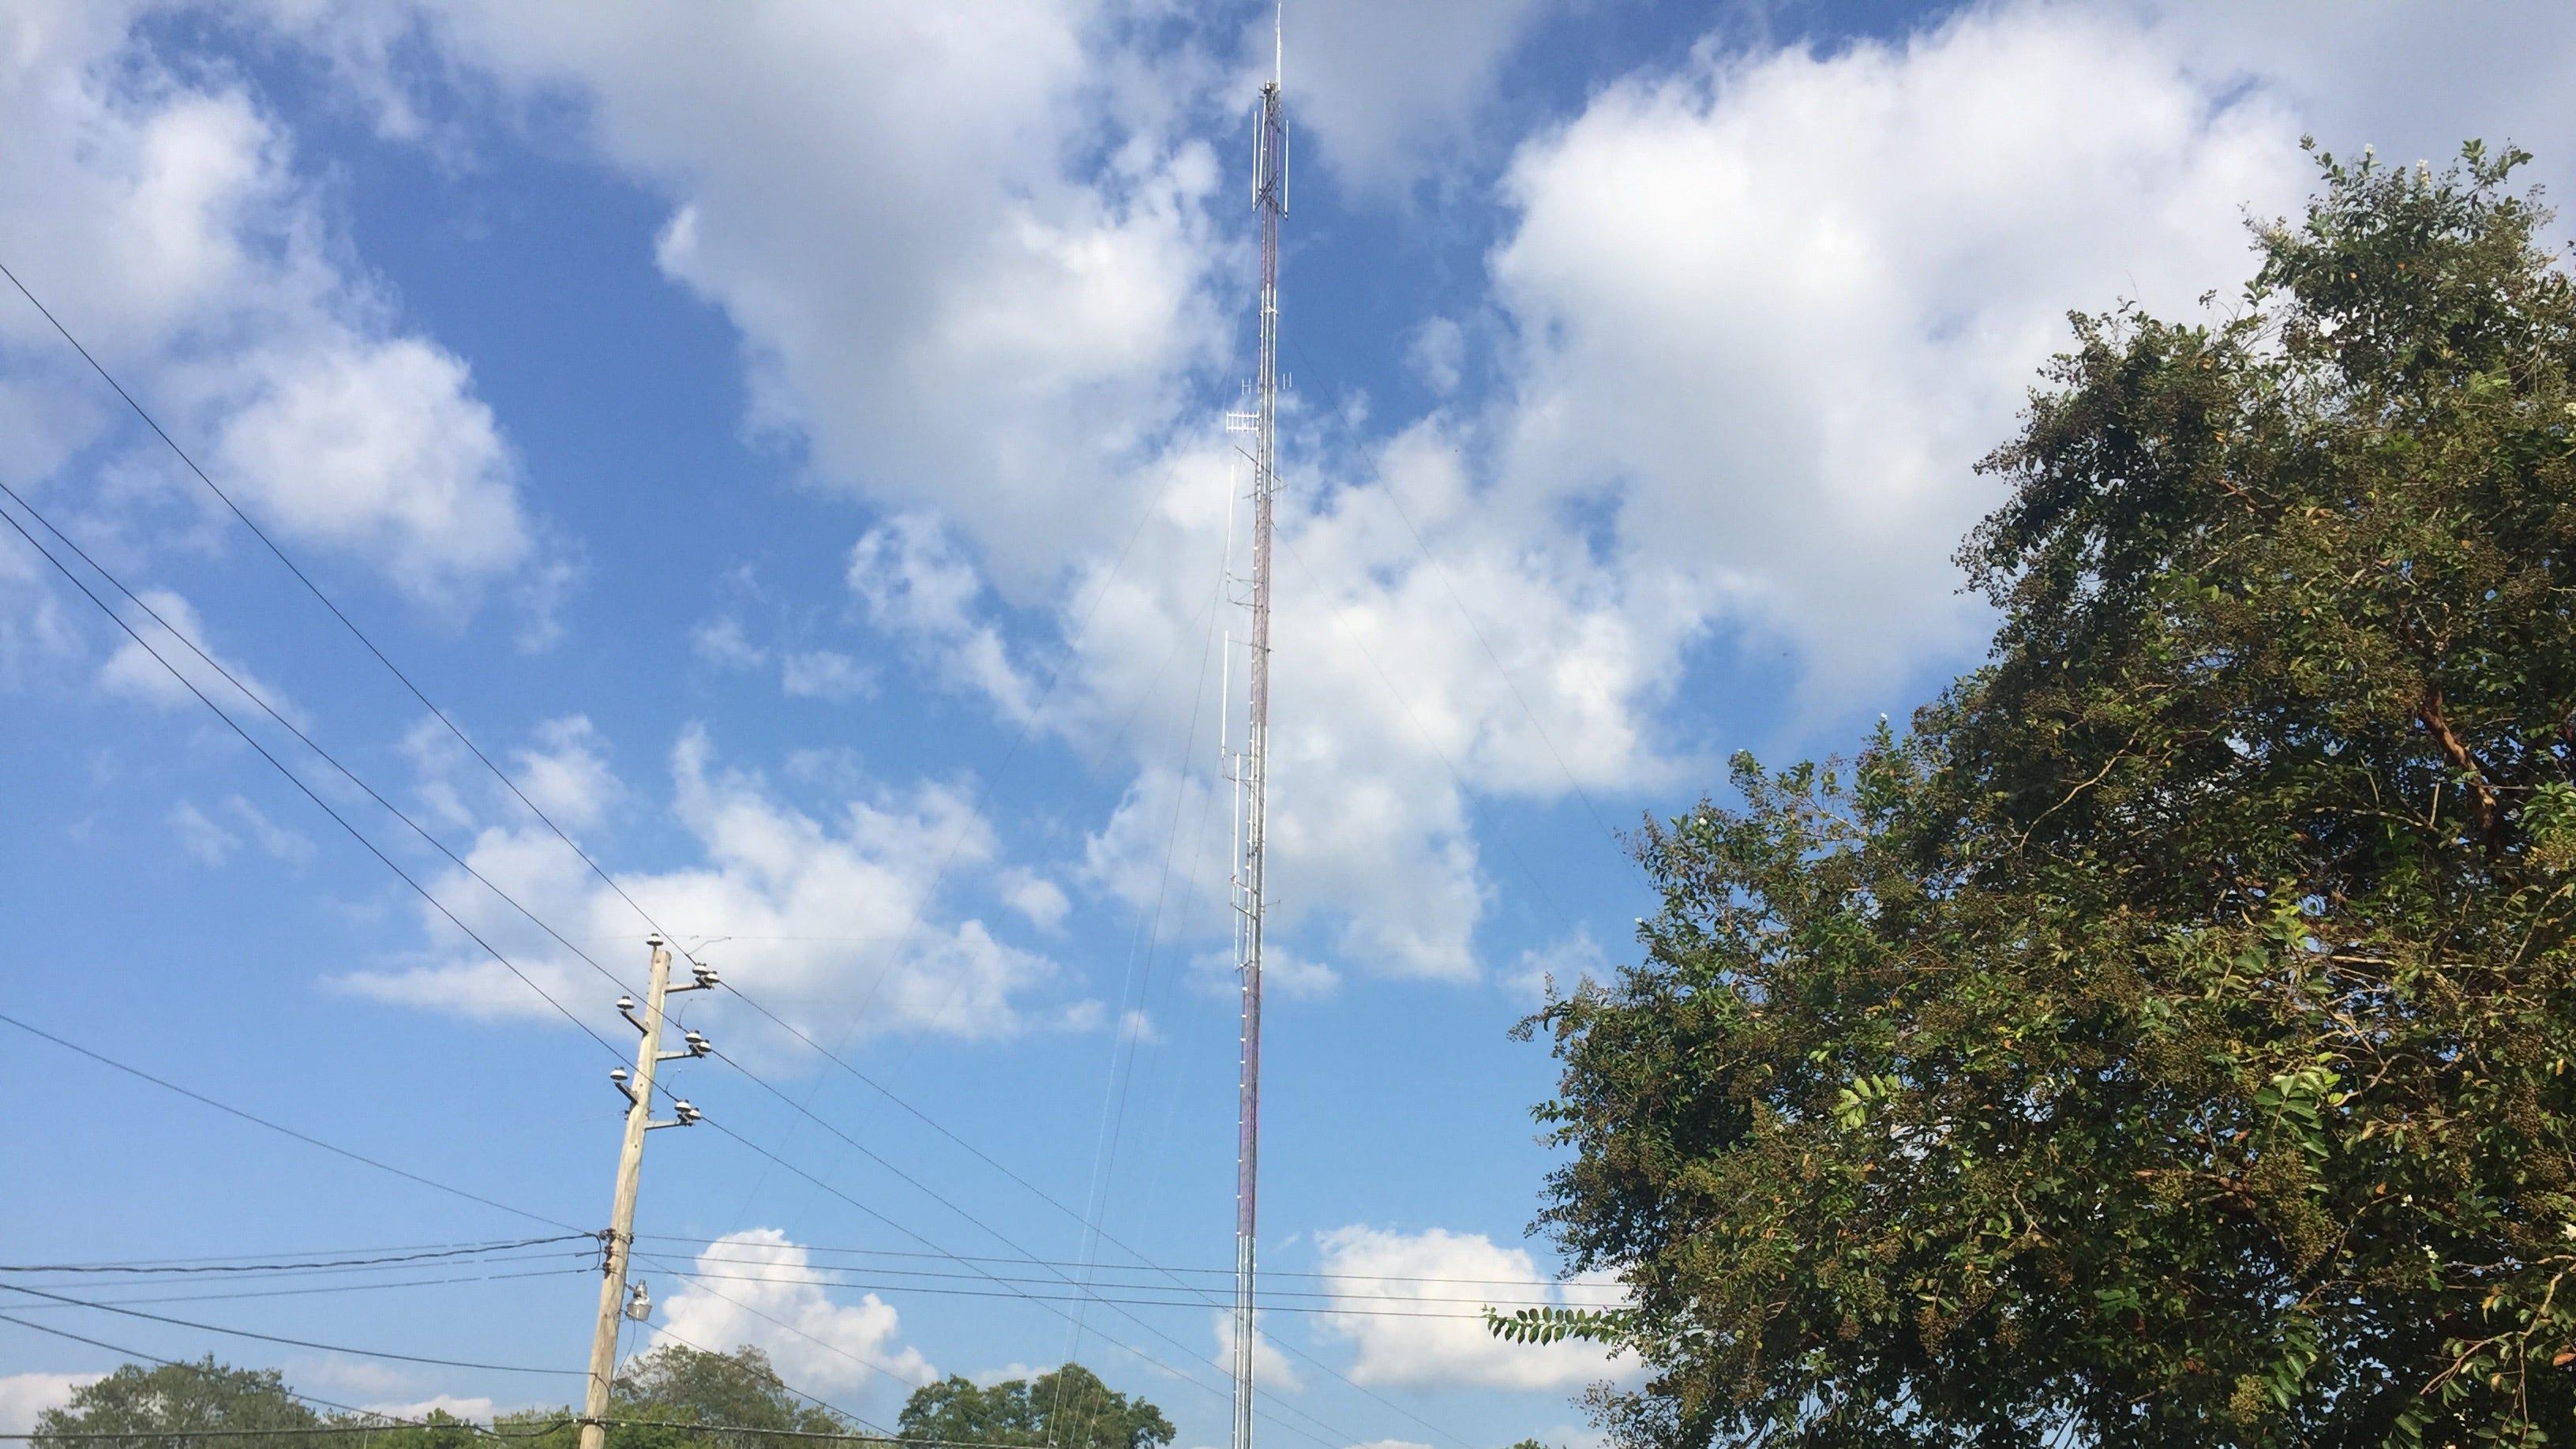 Accomack communications towers need major repairs